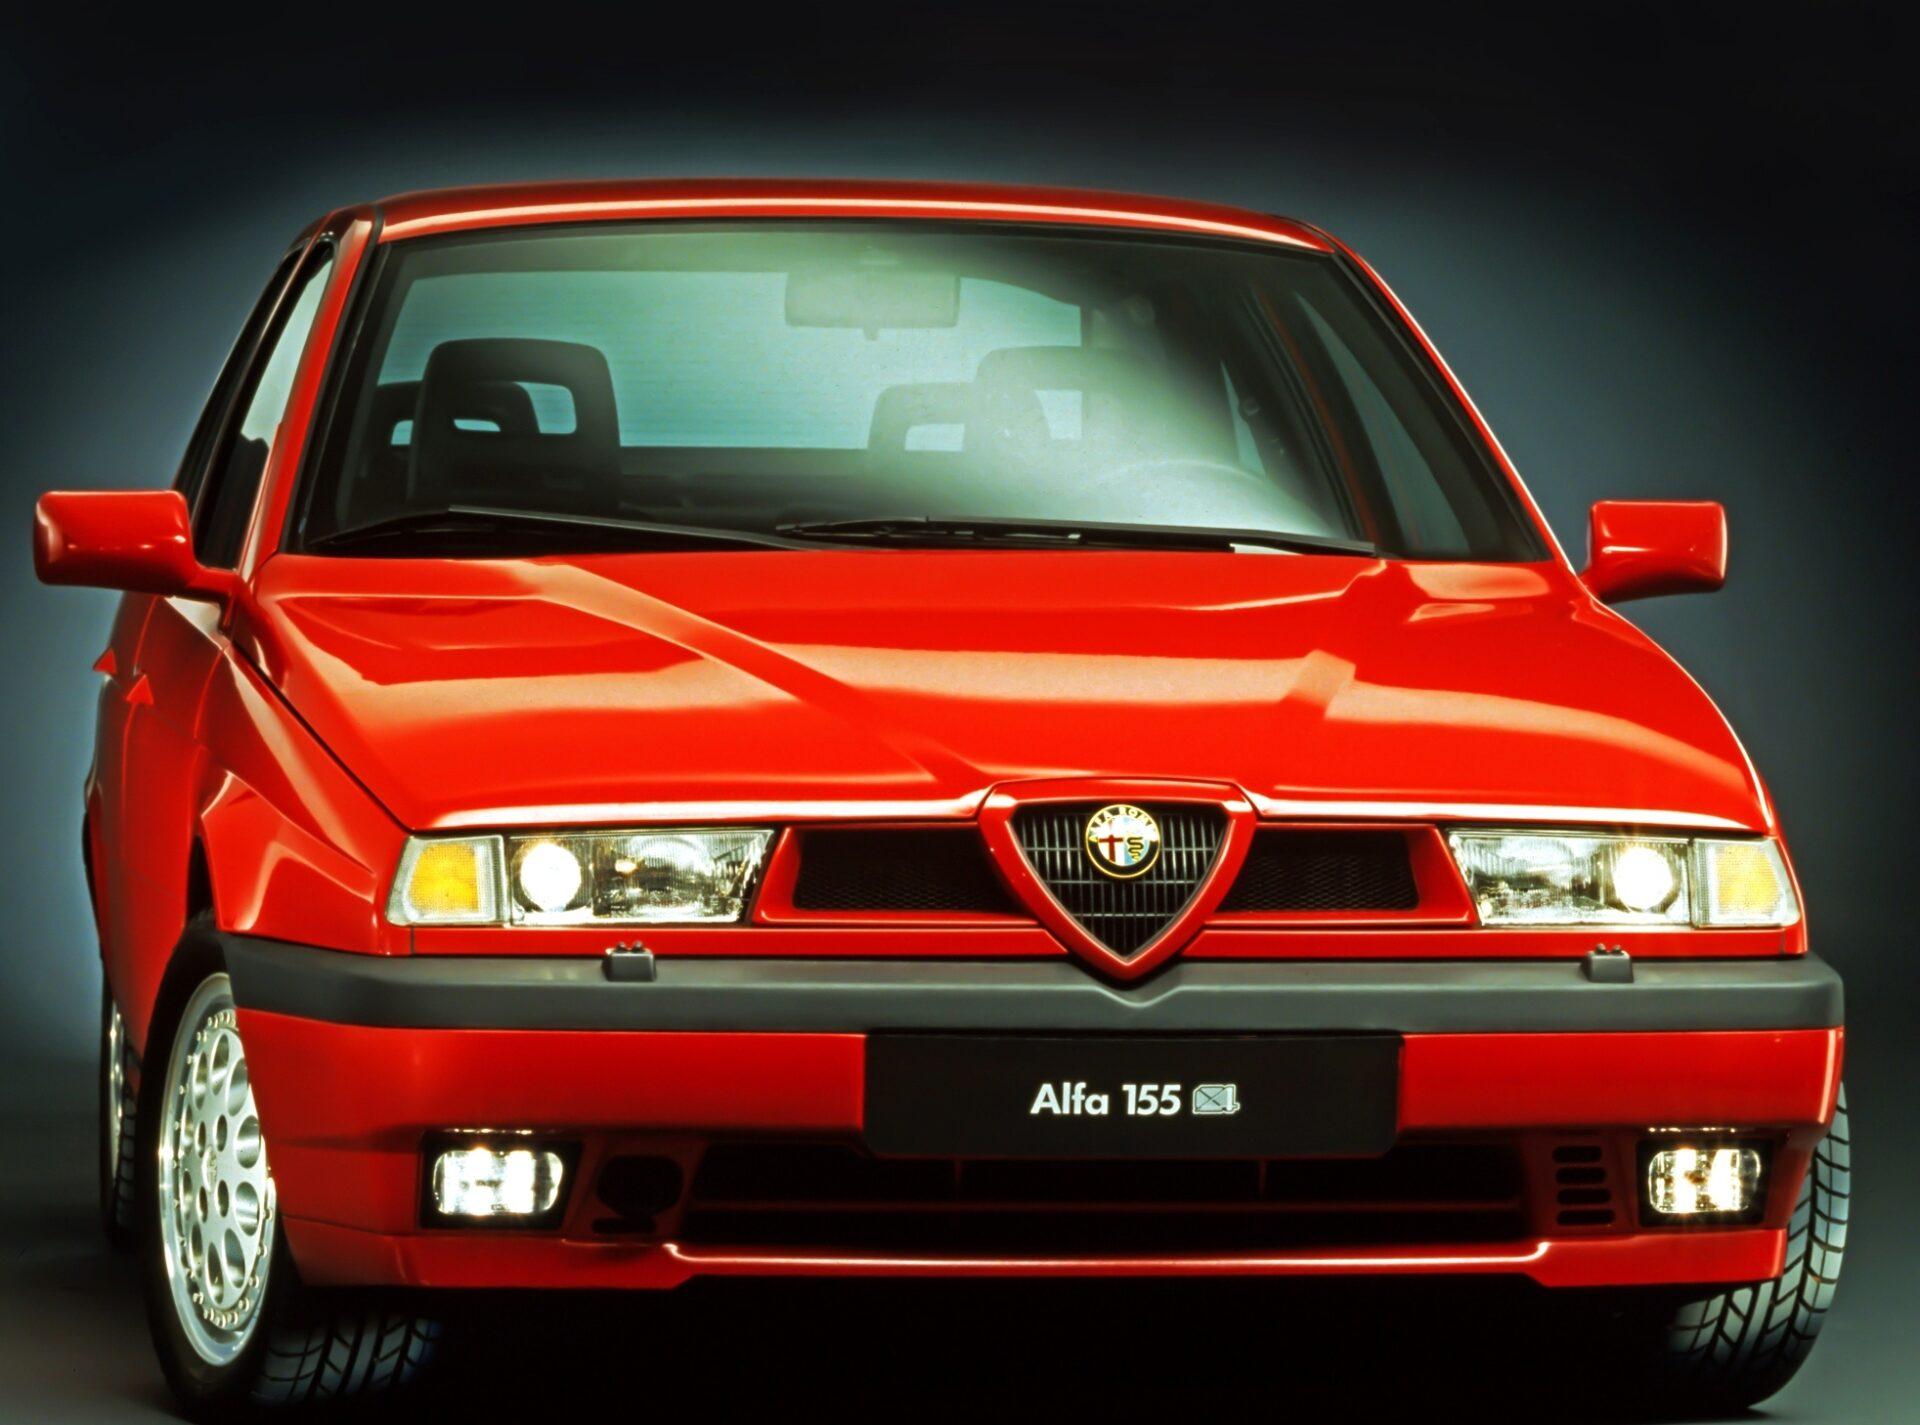 Freni pattini Alfa Romeo 155